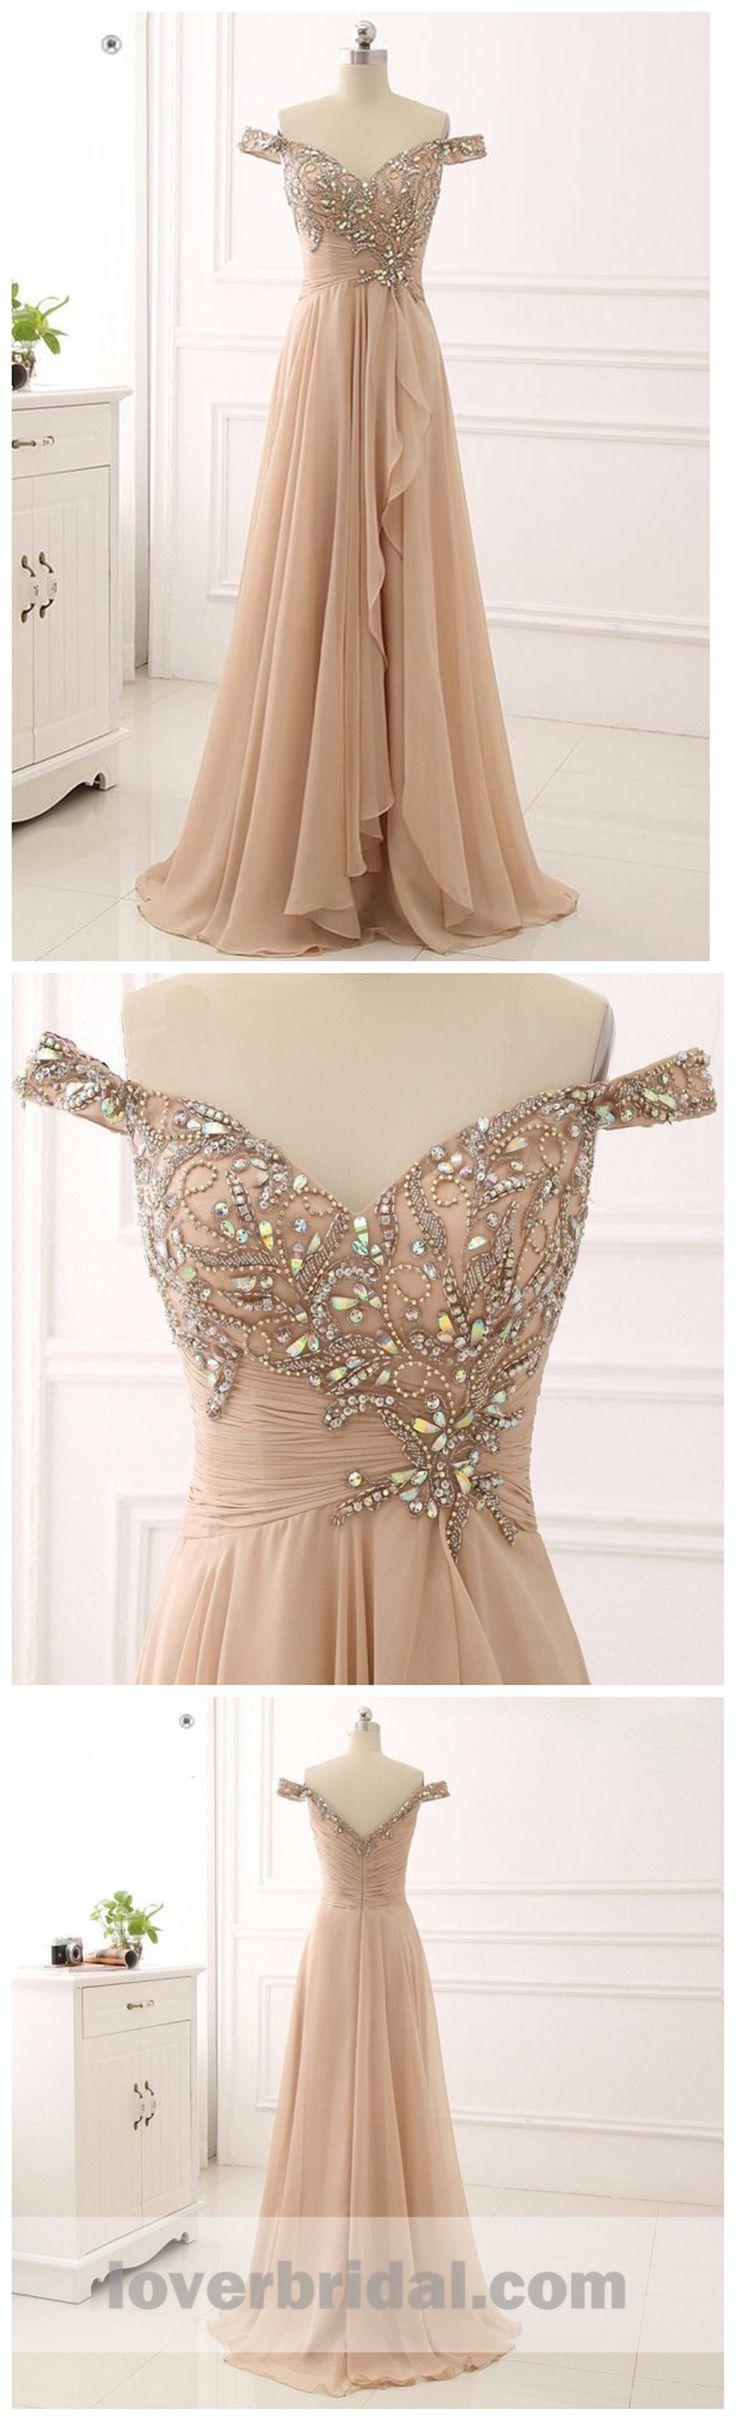 Off Shoulder Delicate Beading Long Custom Evening Prom Dresses, 17426